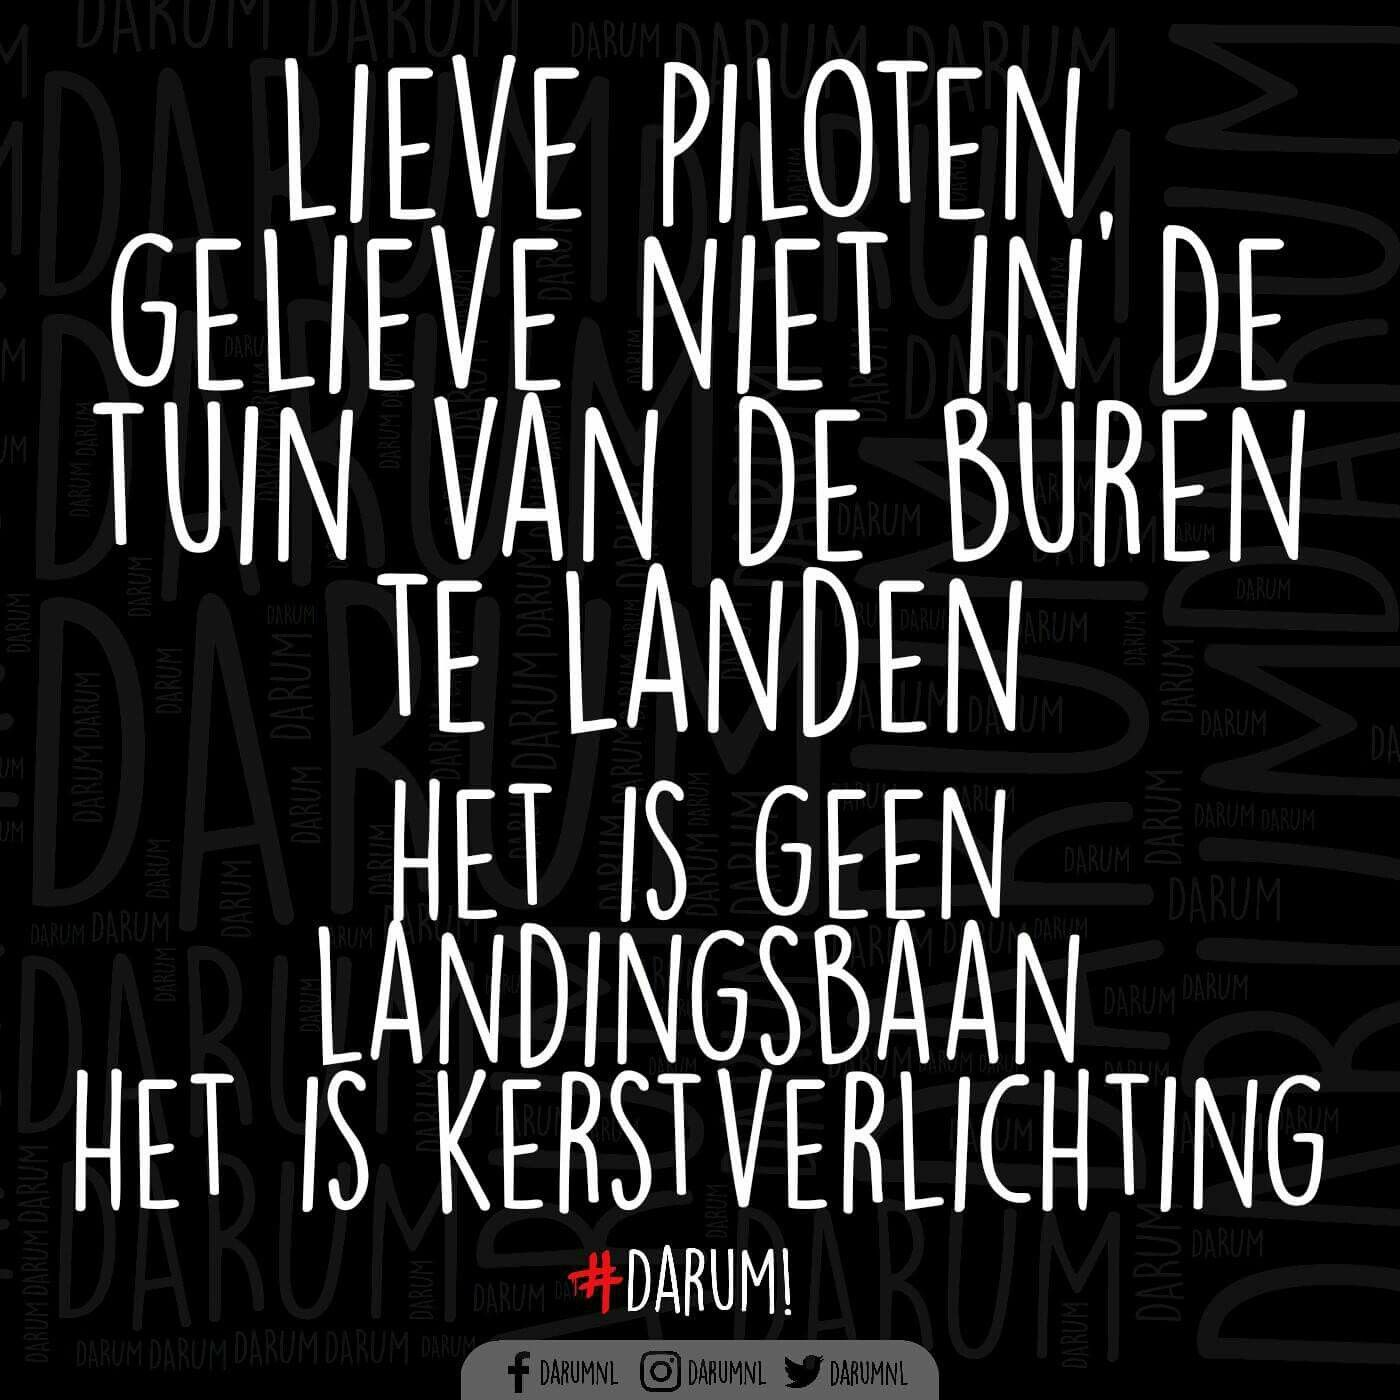 Citaten Kerst Susu : Alvast bedankt nederlandse dutch quotes pinterest